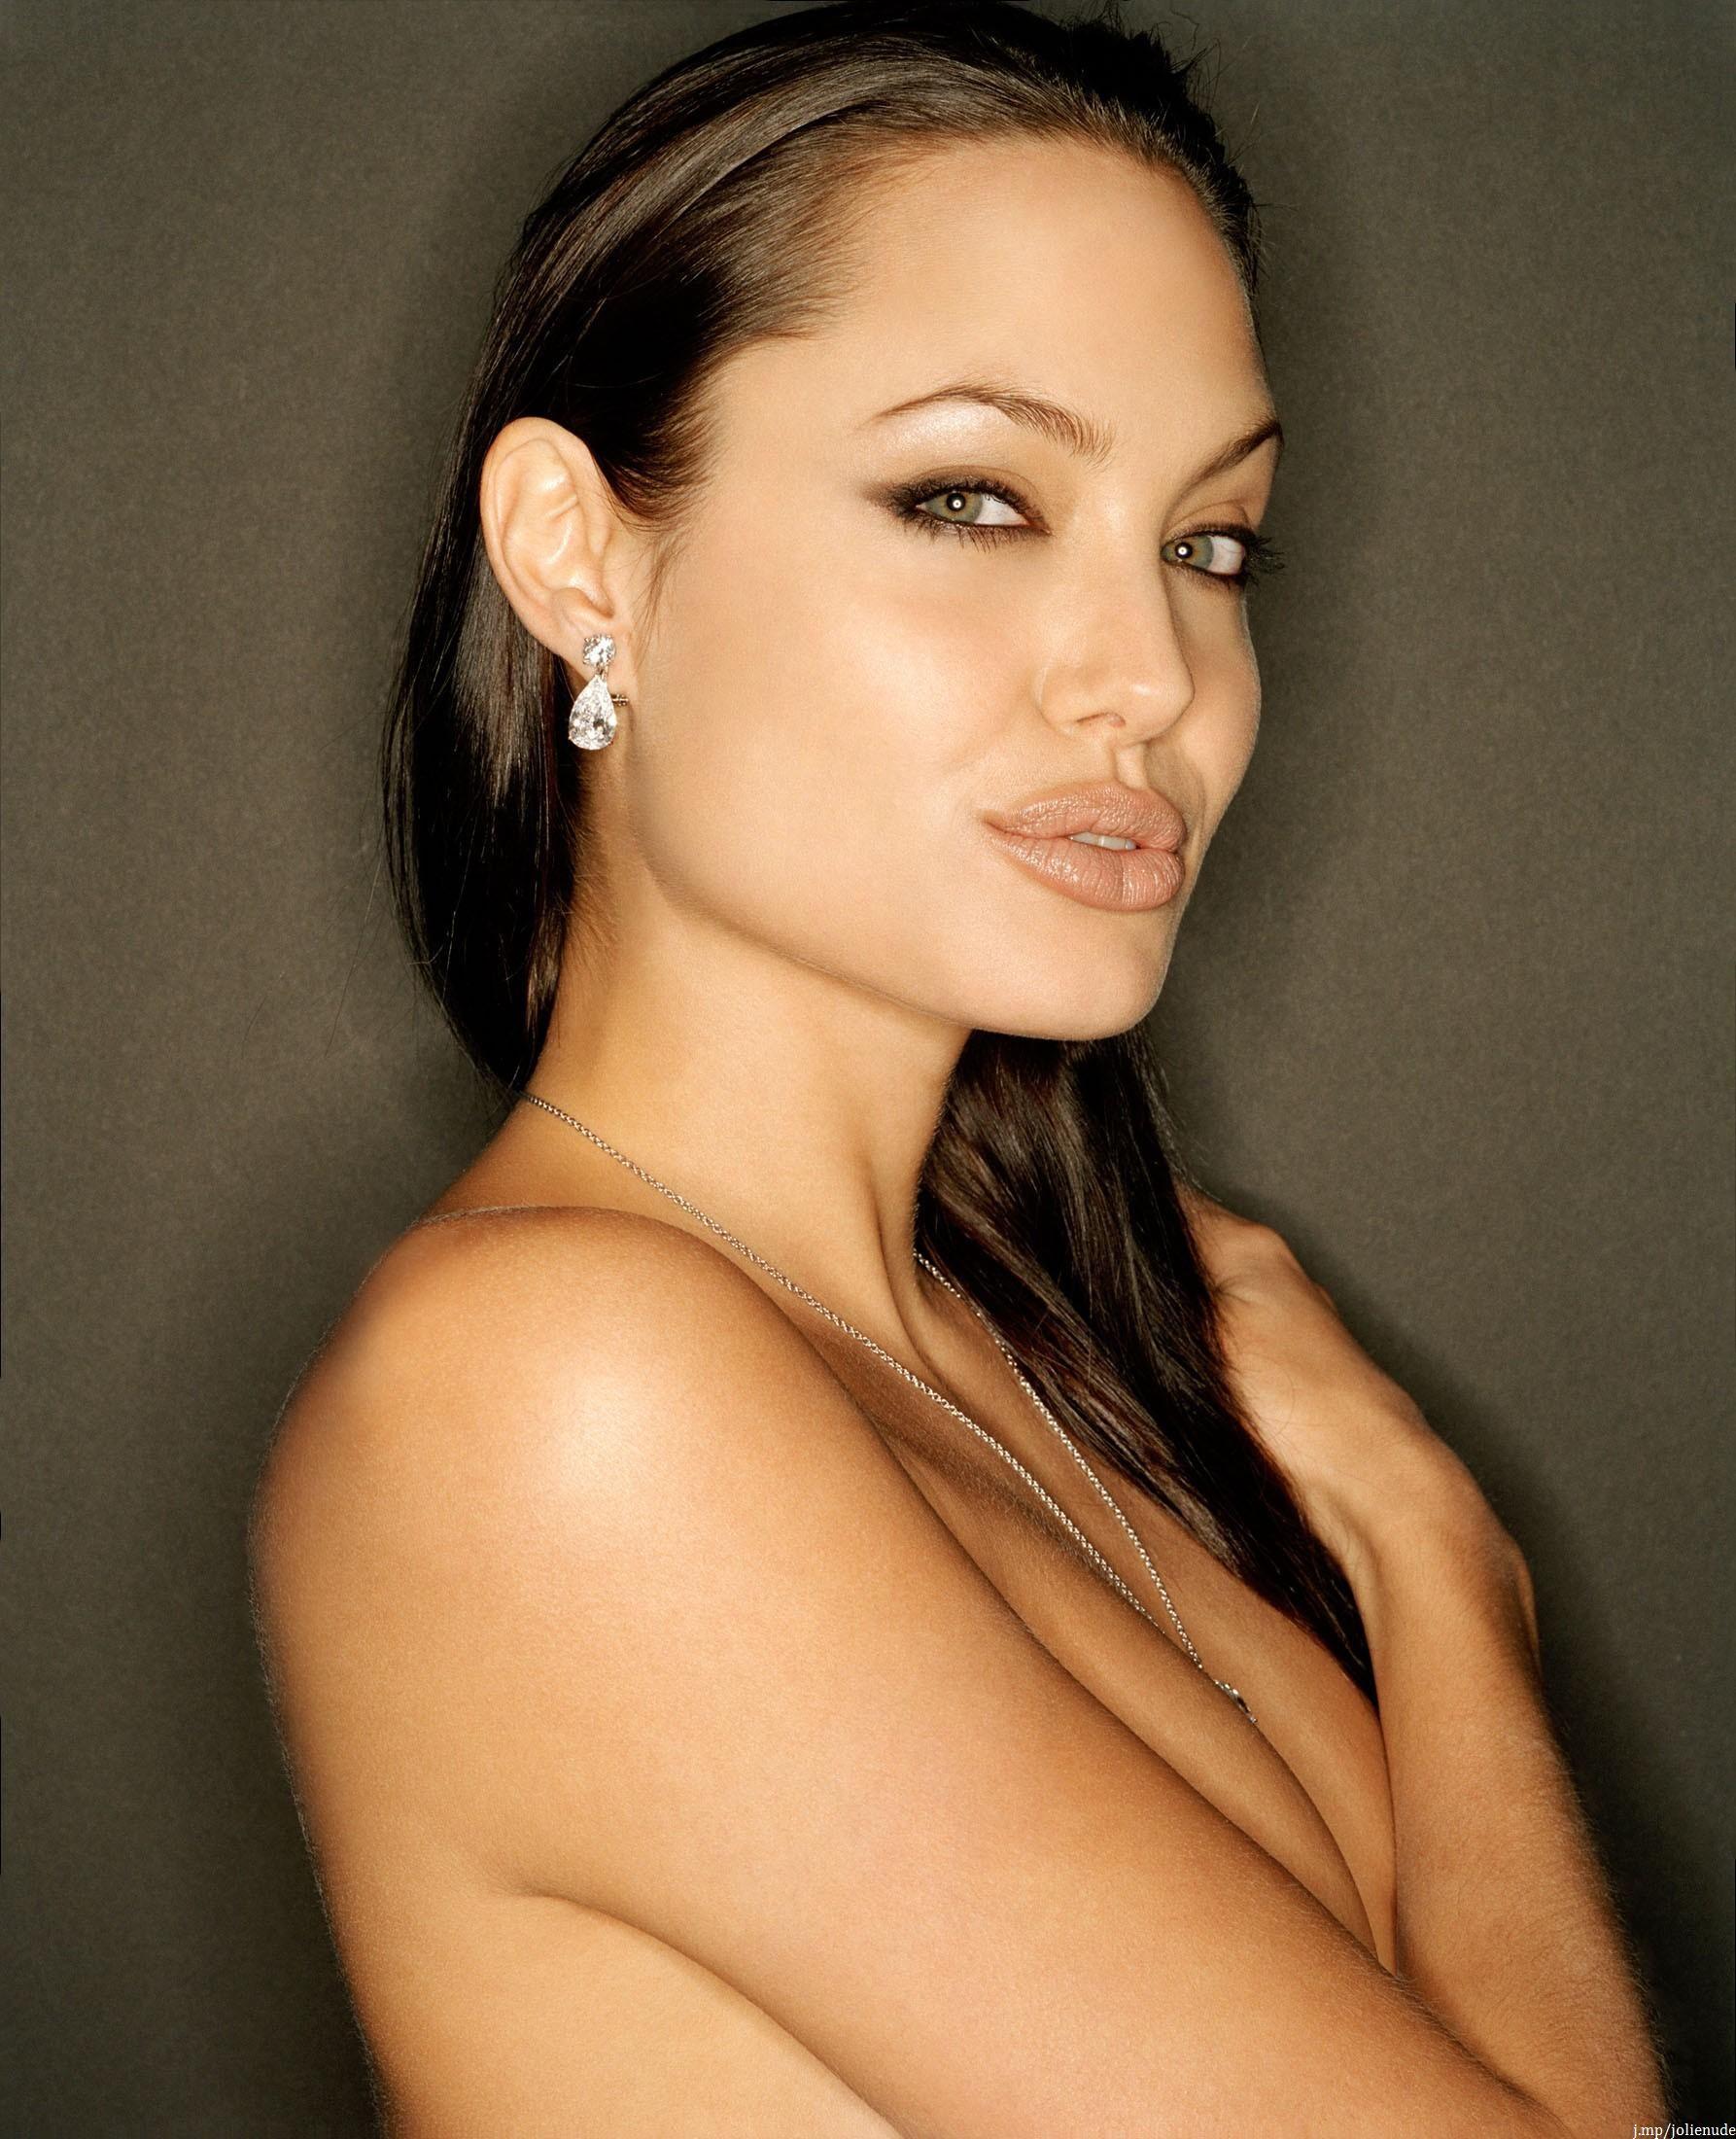 Angela jolie nude pic